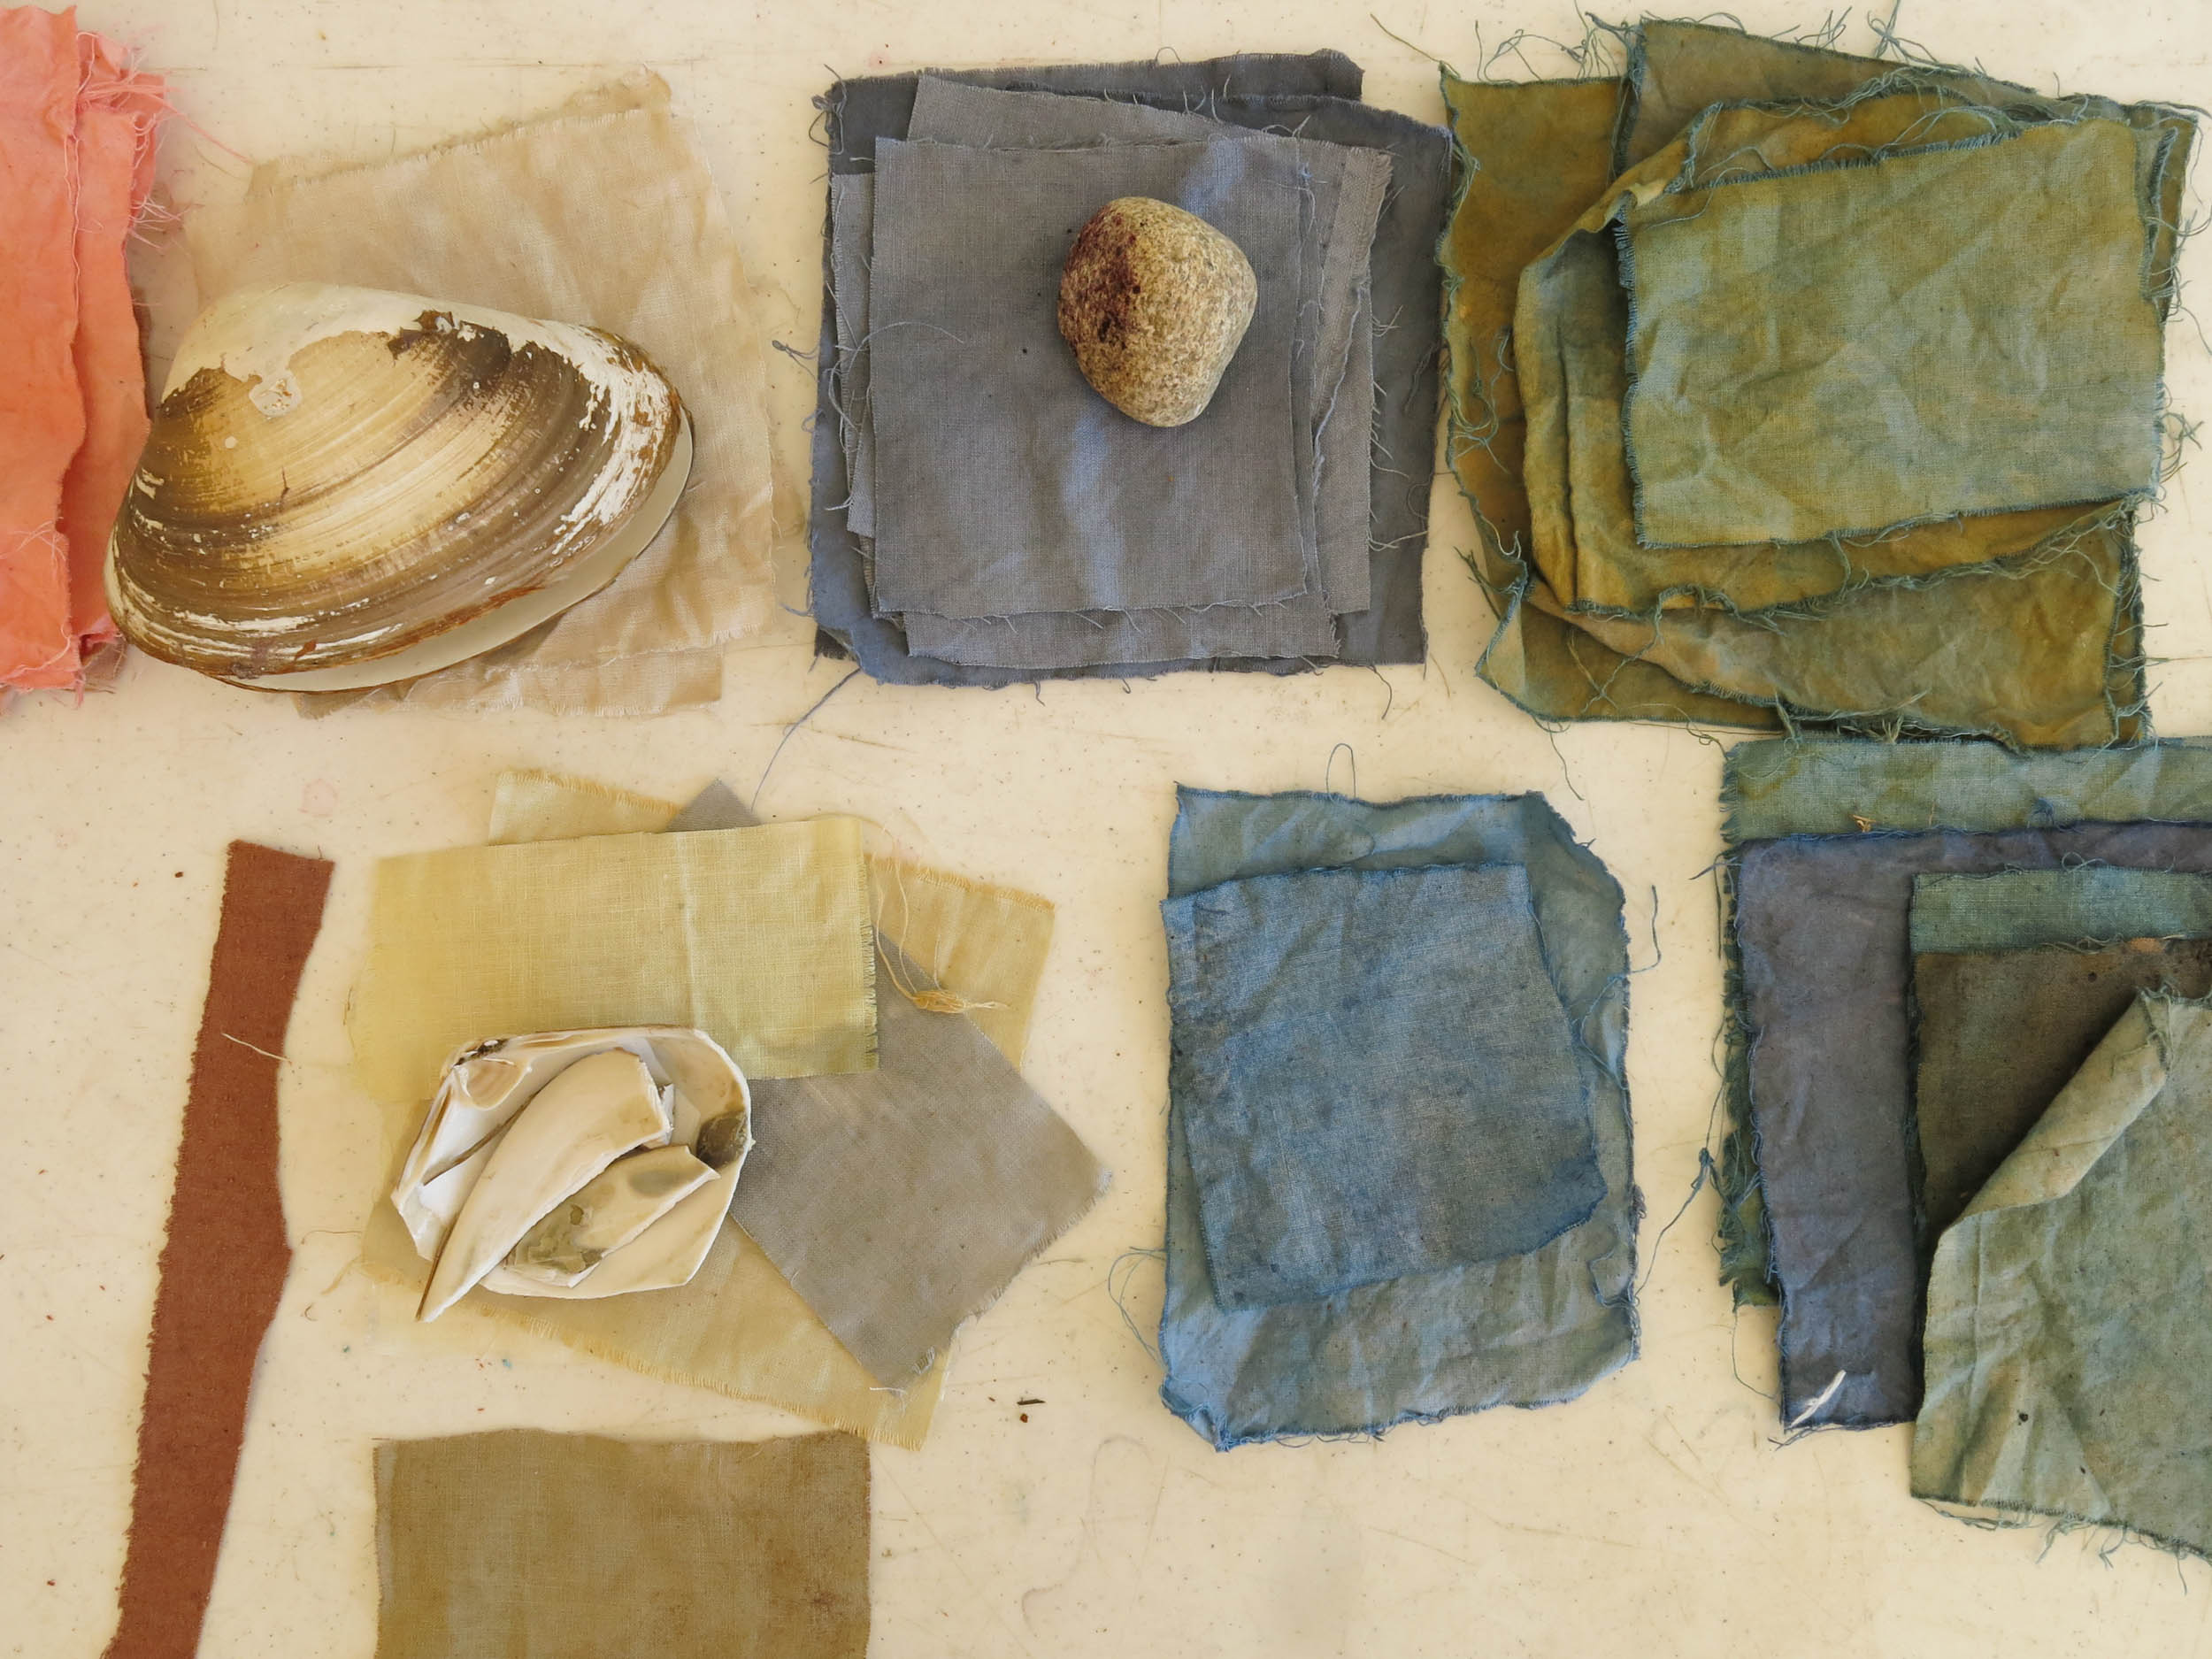 dye sample piles (1 of 1).jpg